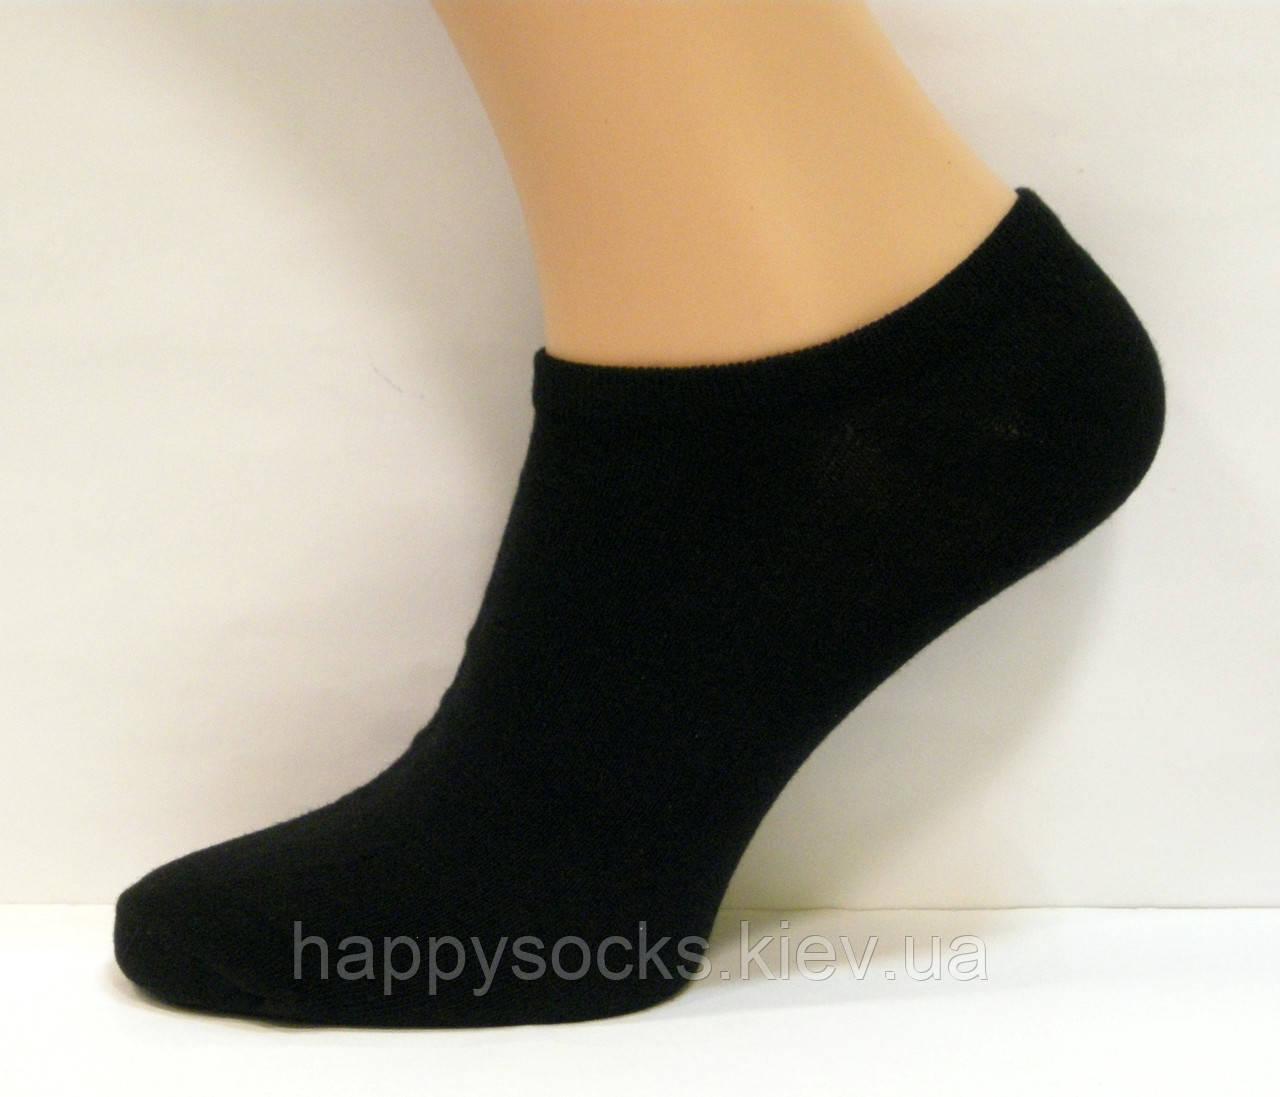 Короткие носки для мужчин черного цвета